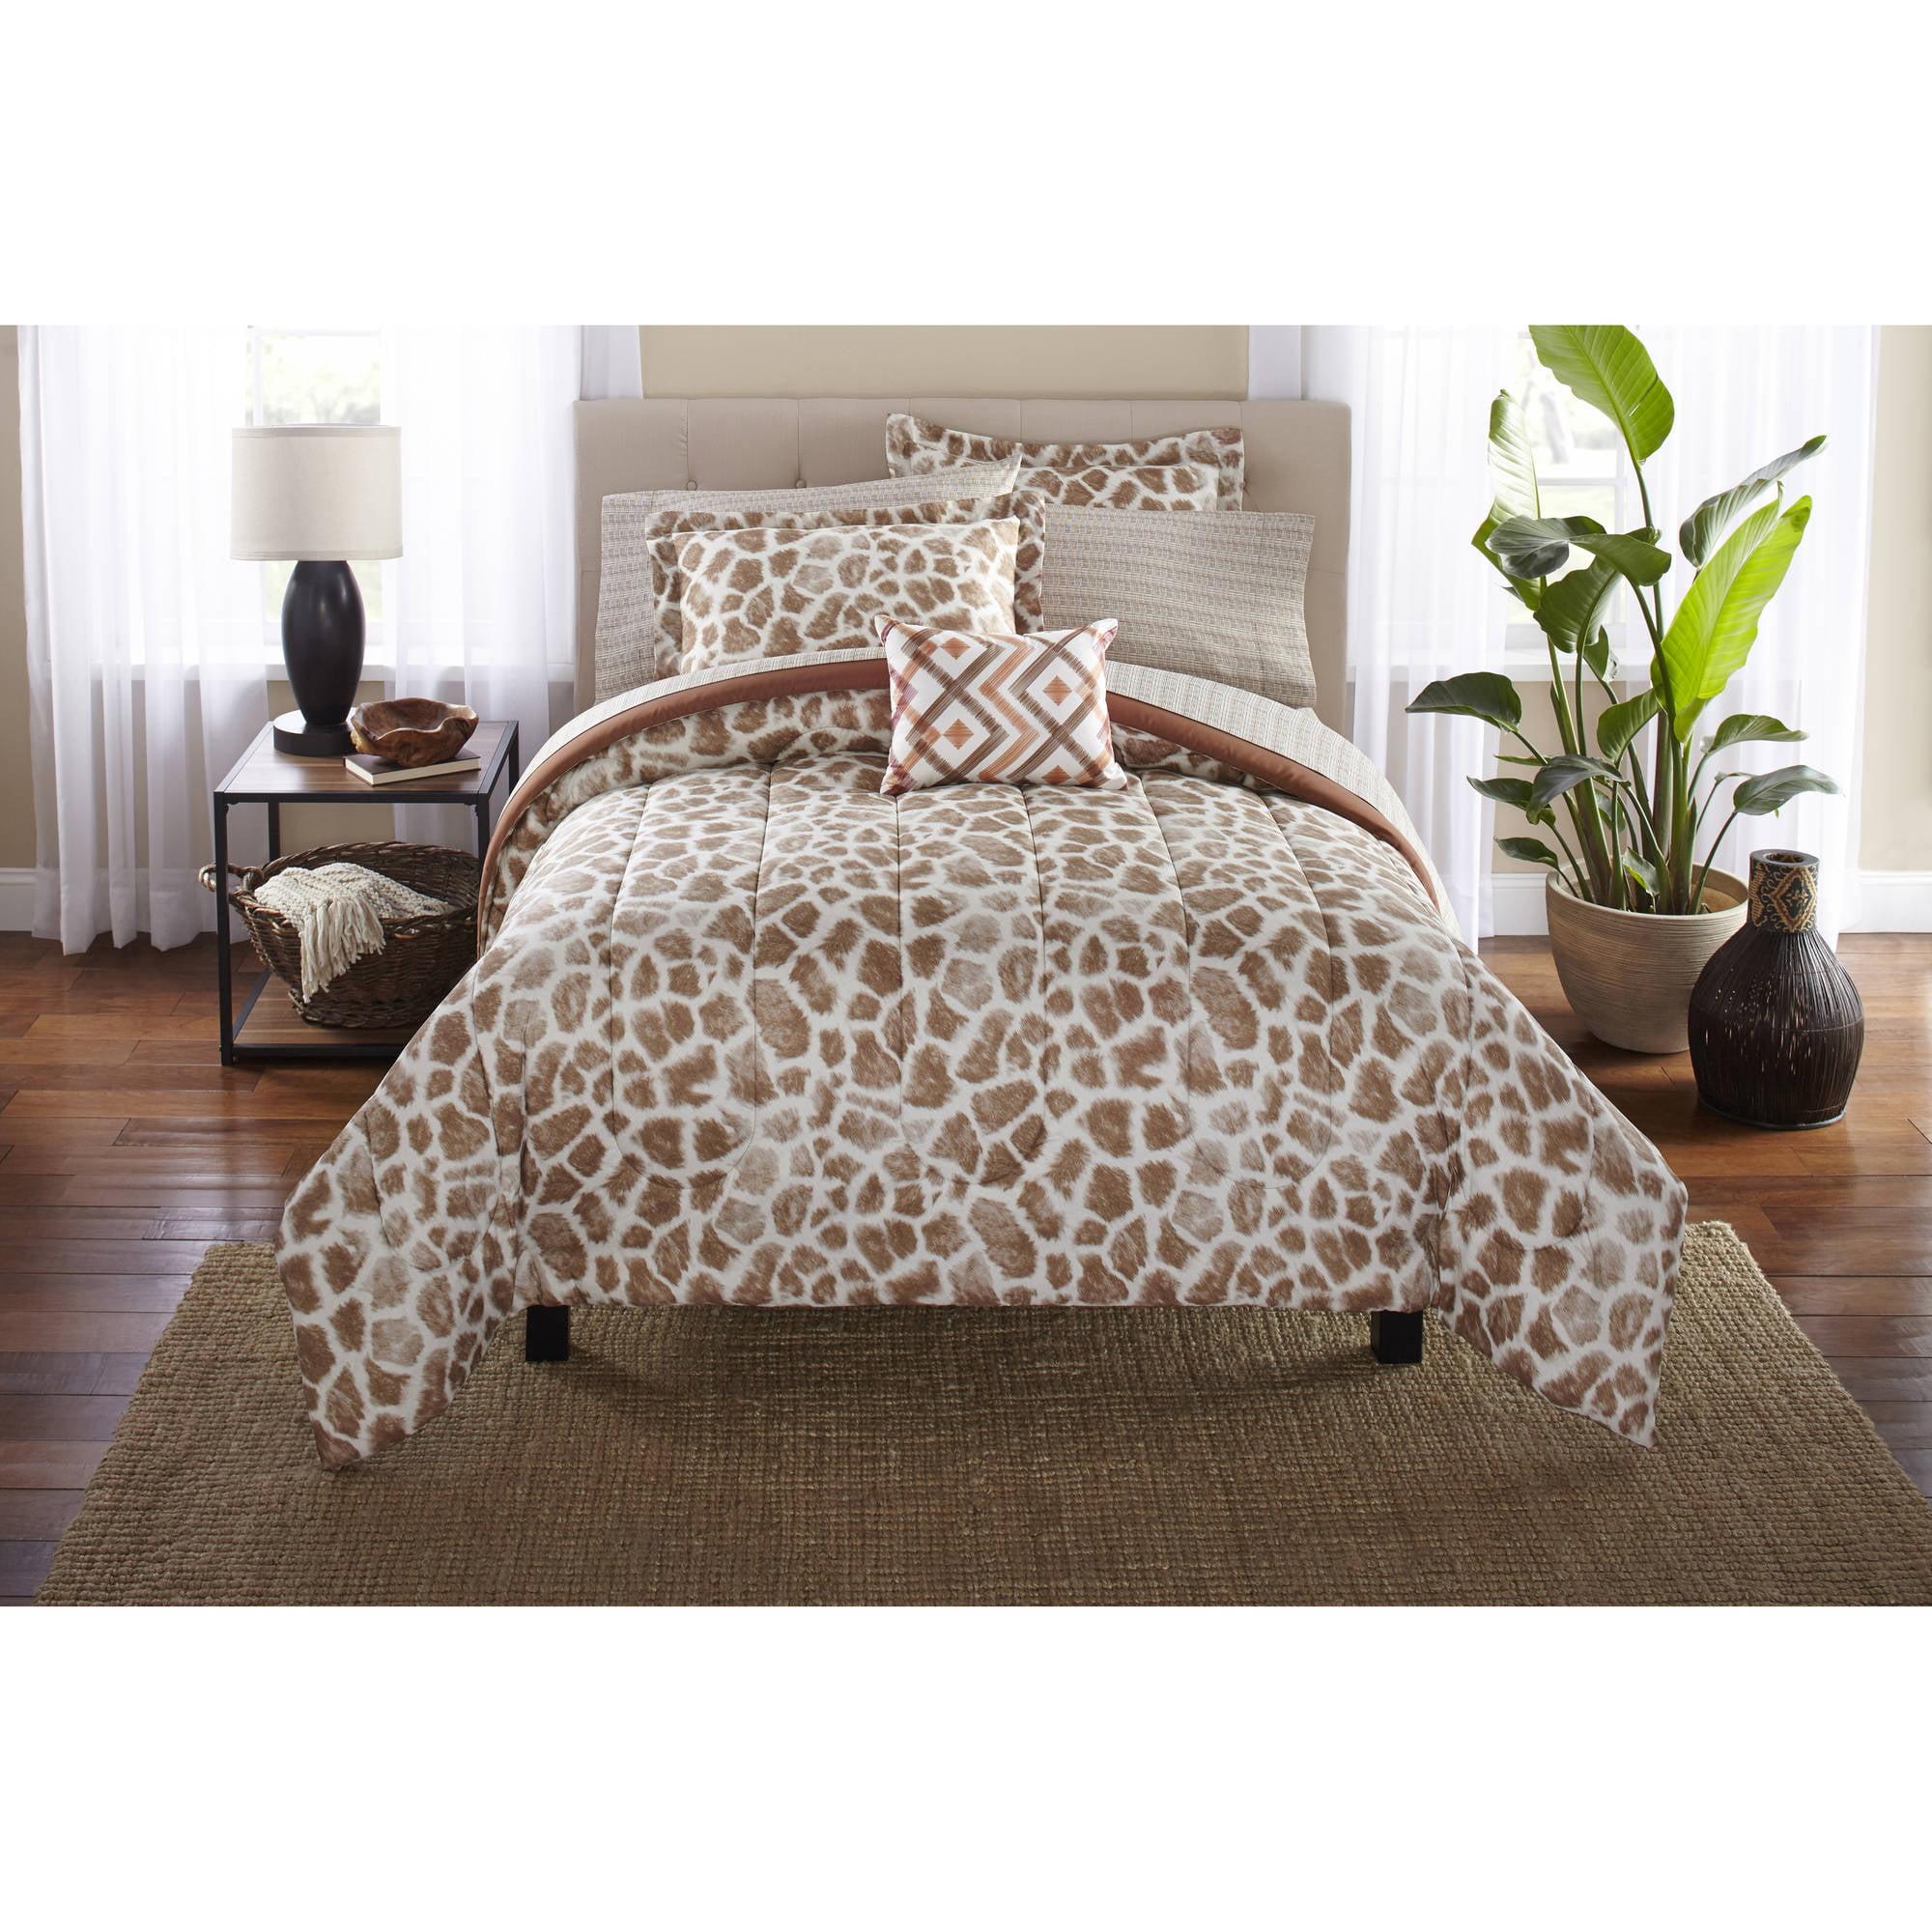 Mainstays Bed in a Bag Bedding Comforter Set, Giraffe